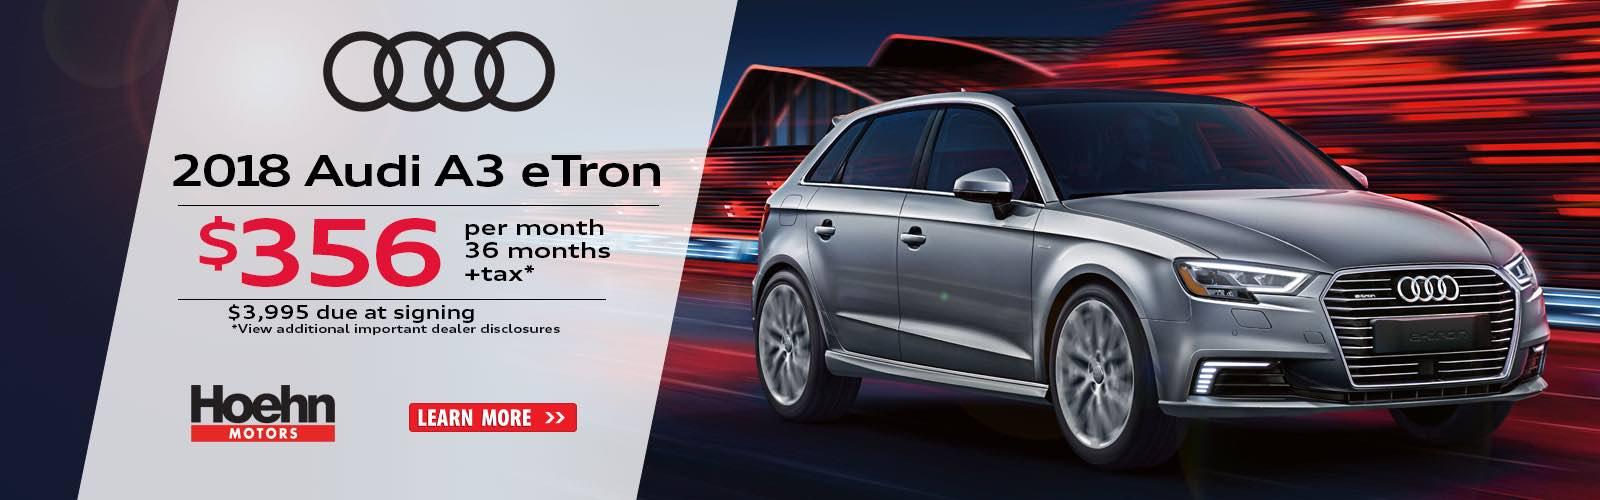 Audi Carlsbad A Hoehn Motors Company New Audi Dealership In - Audi dealers in california